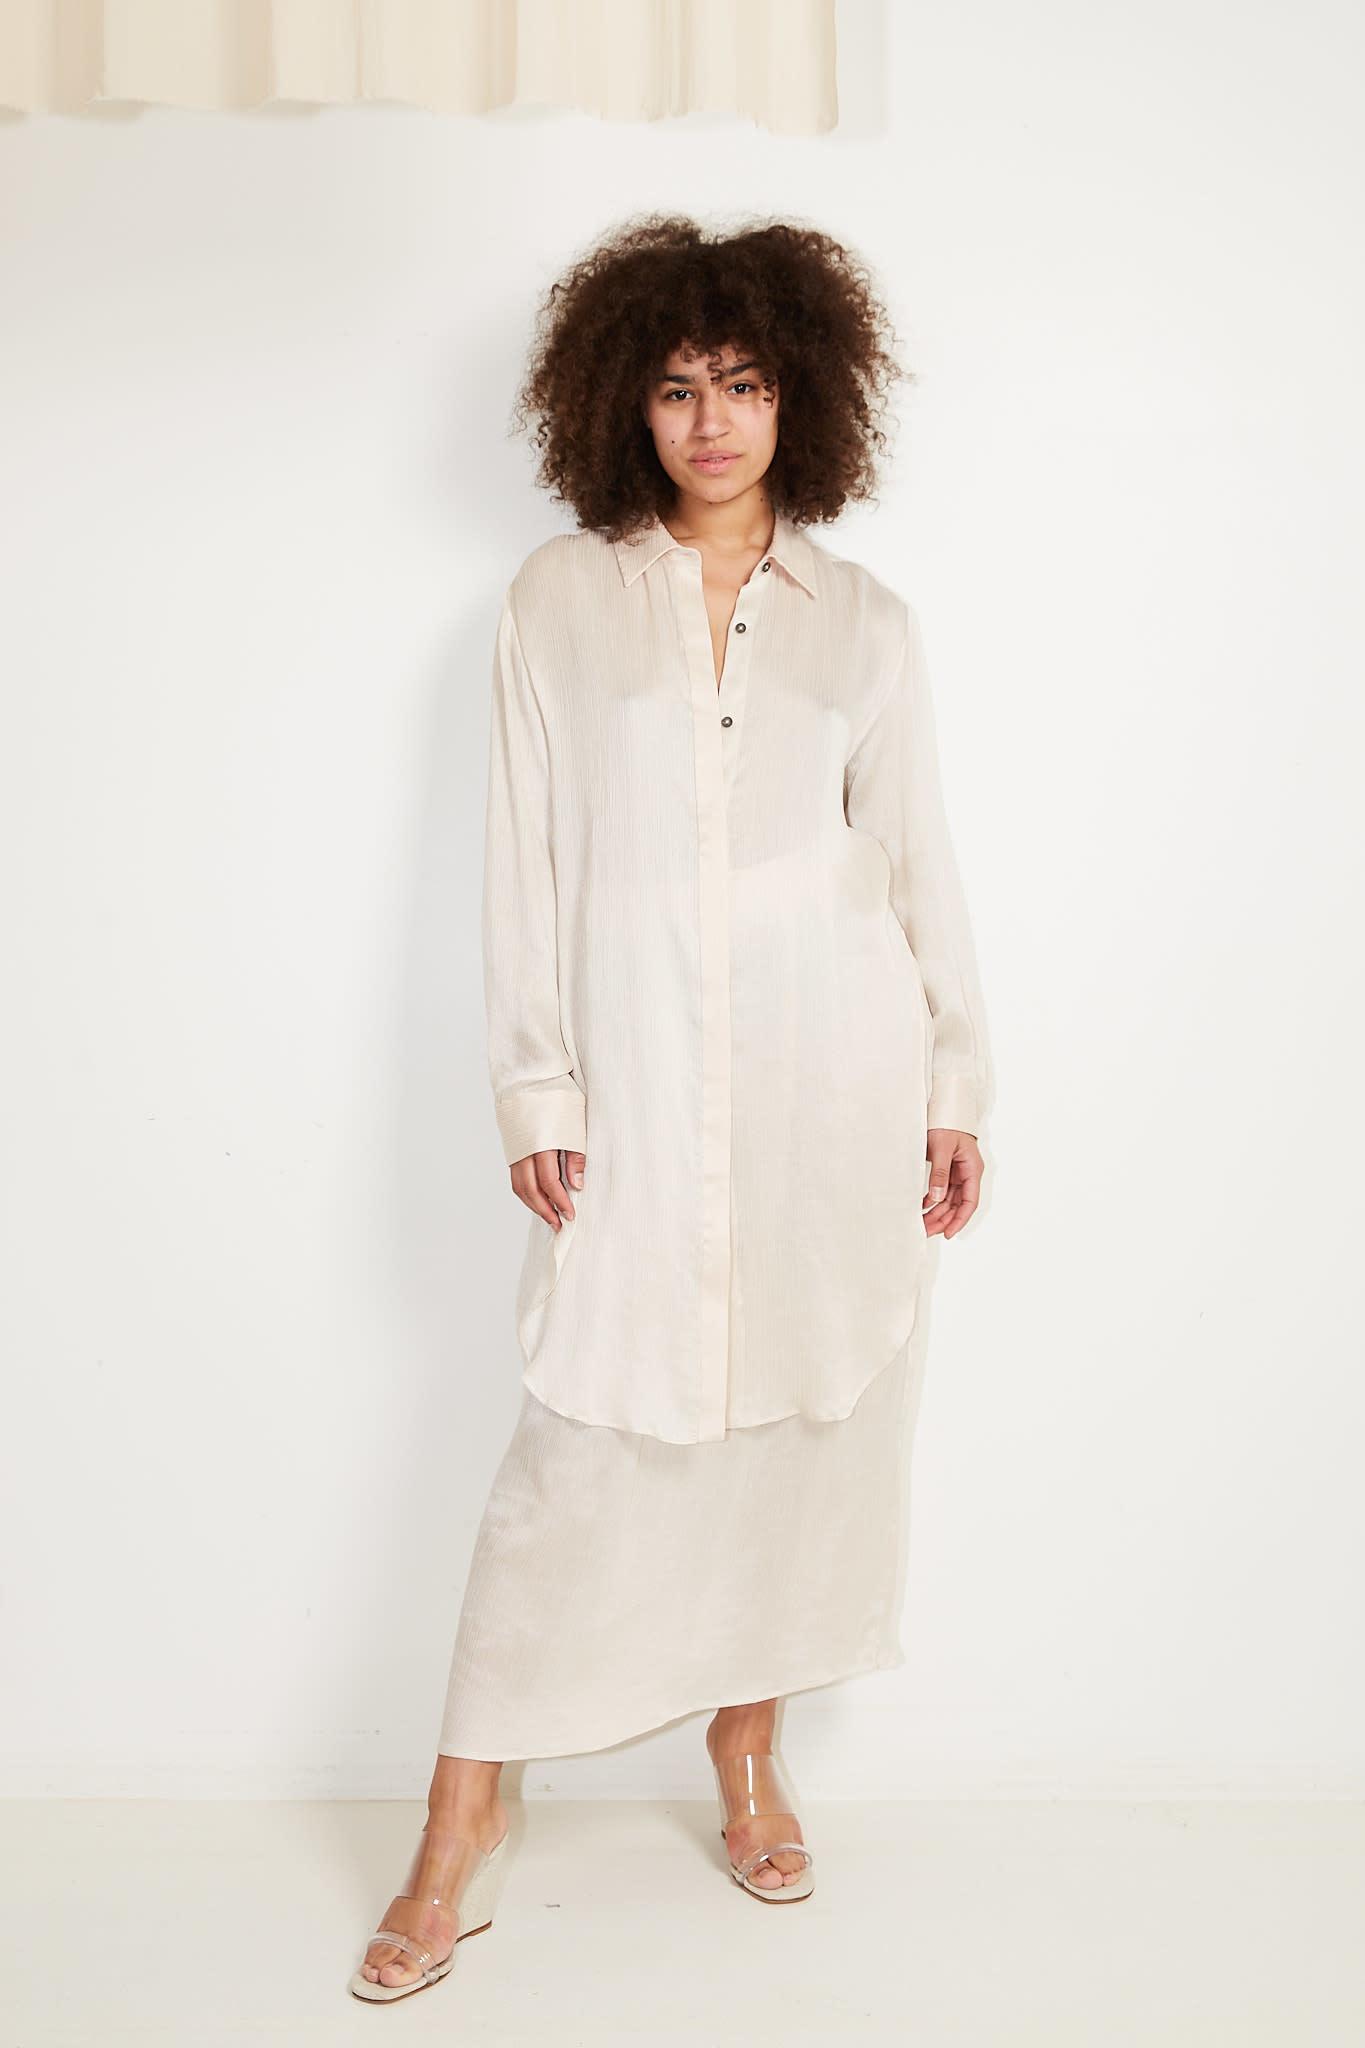 Mara Hoffman - Agata tencell lyocel woven dress